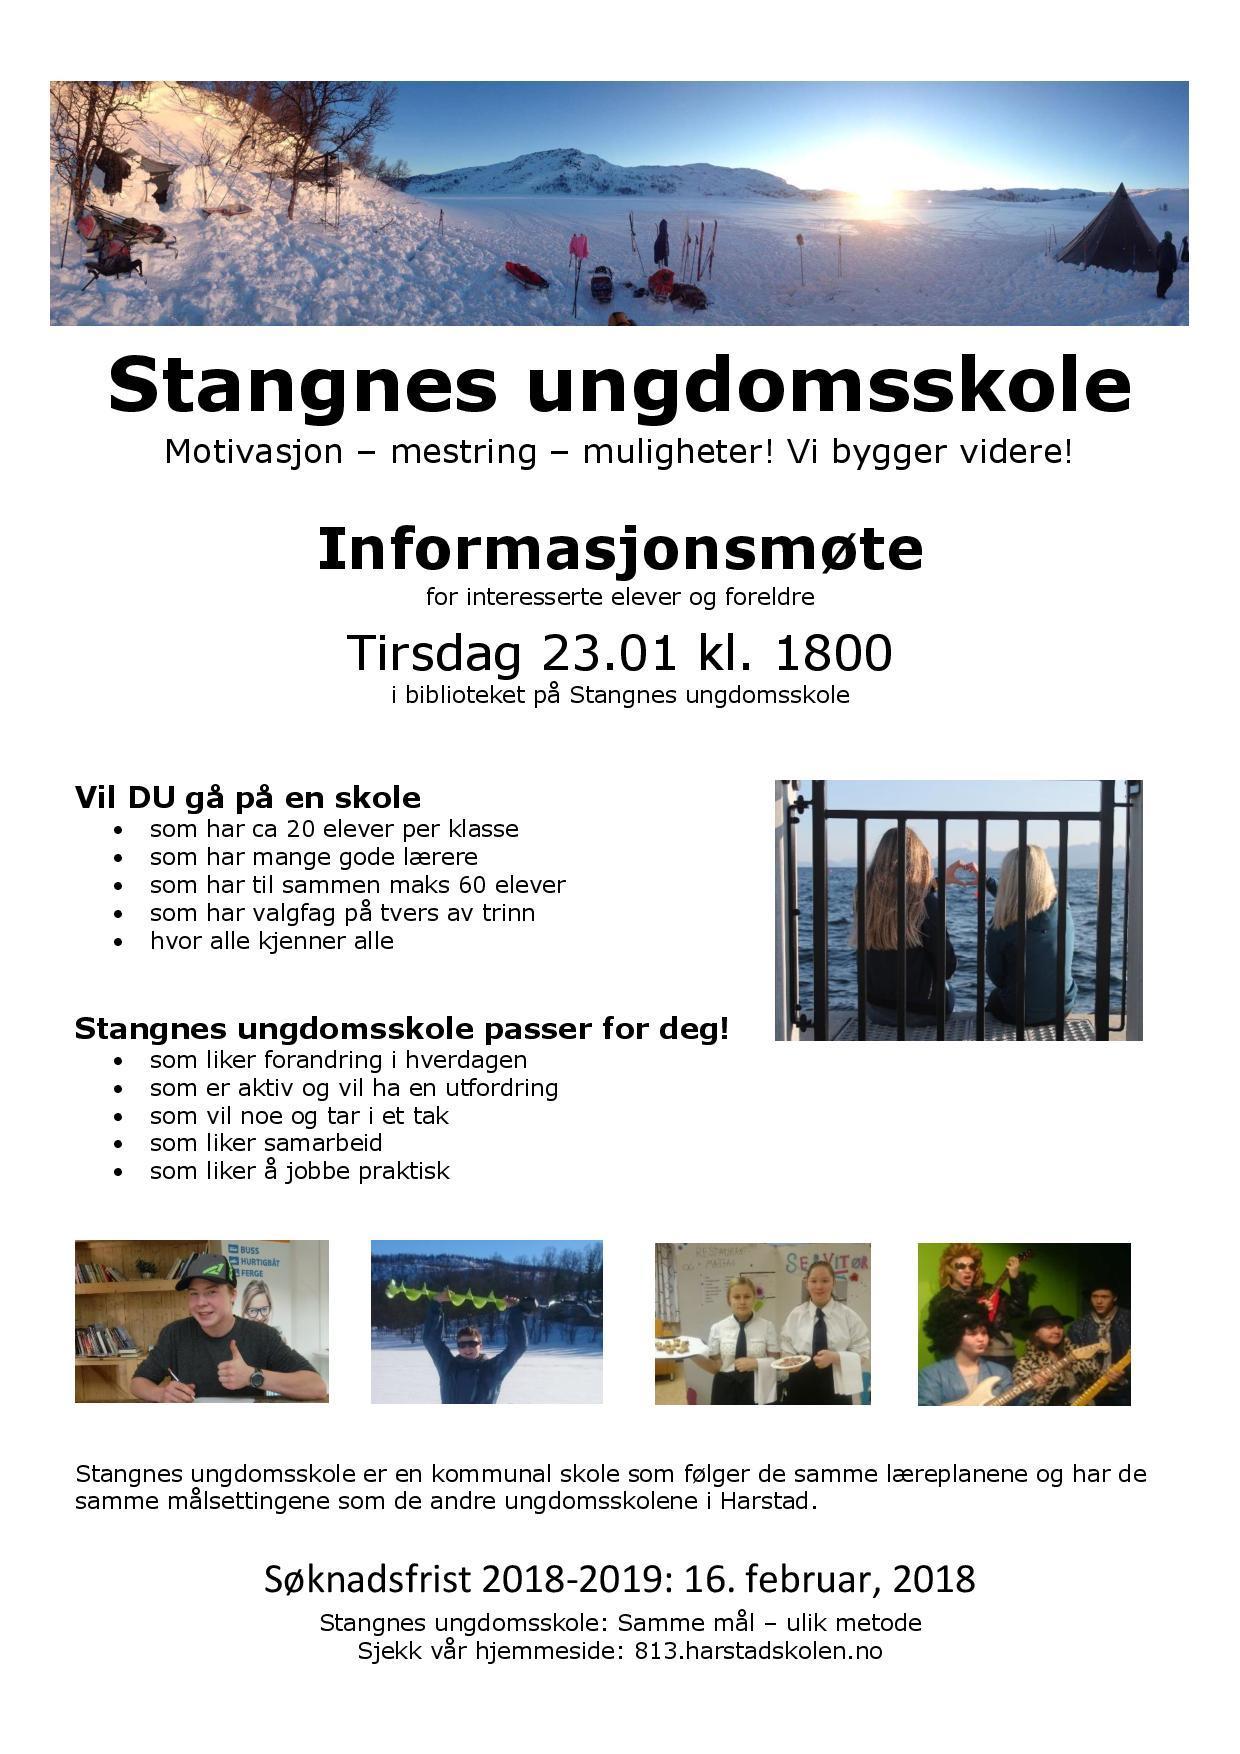 2018-01-16 En side promo 2 - Stangnes ungdomsskole-jpg.jpg